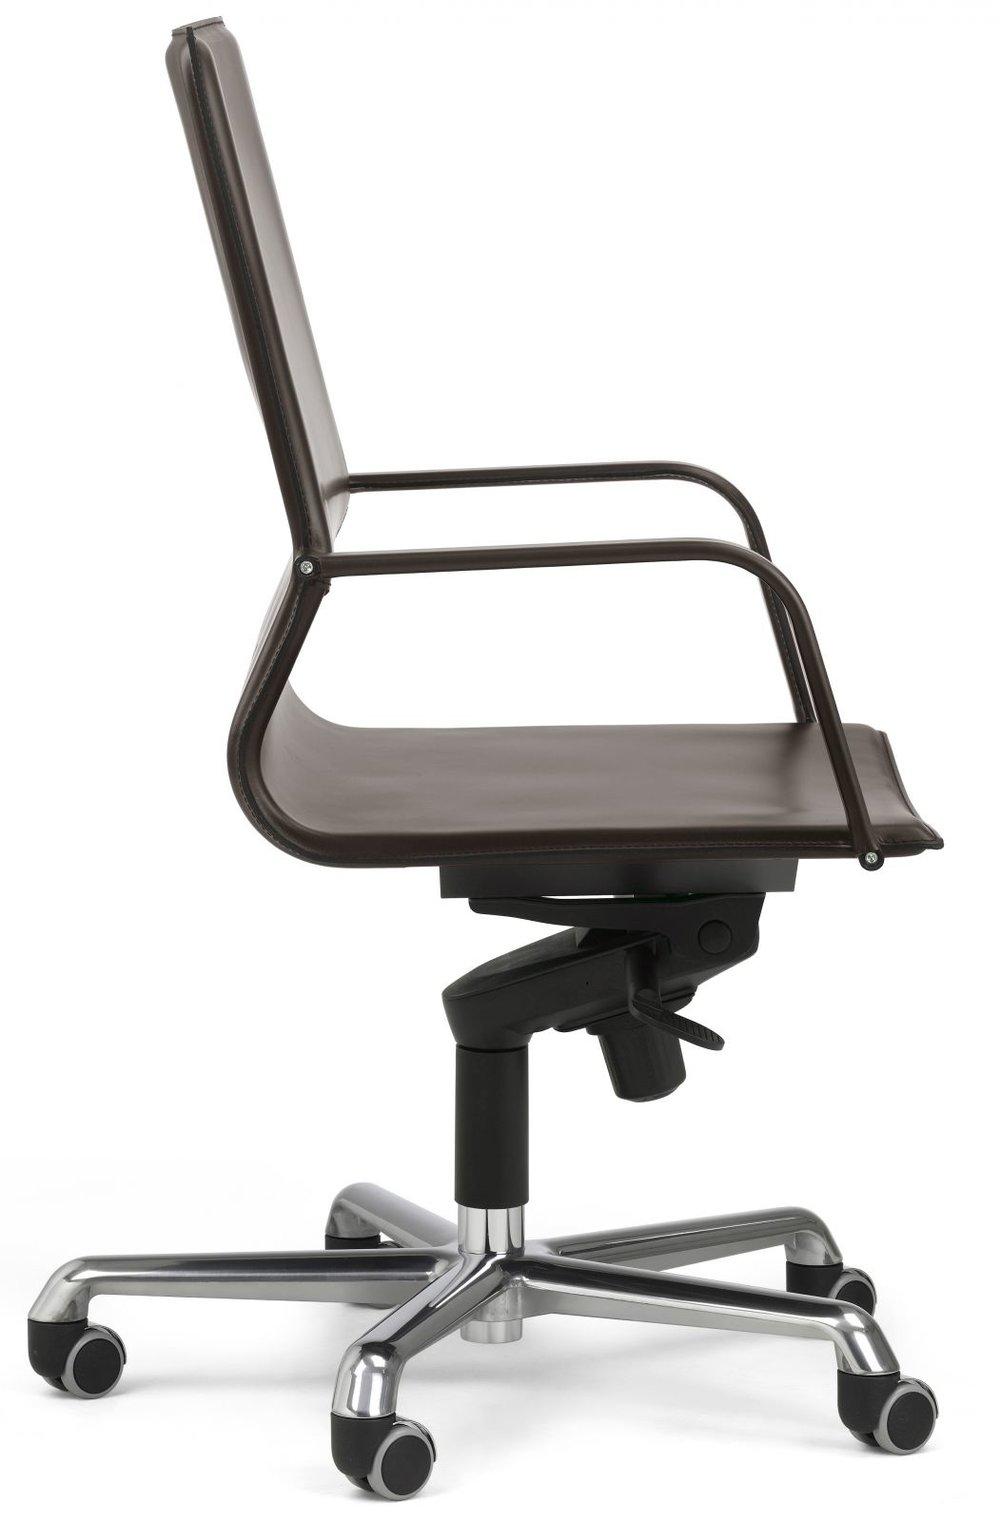 modern-office-chairs-Italian-furniture-designer-chairs (46).jpg